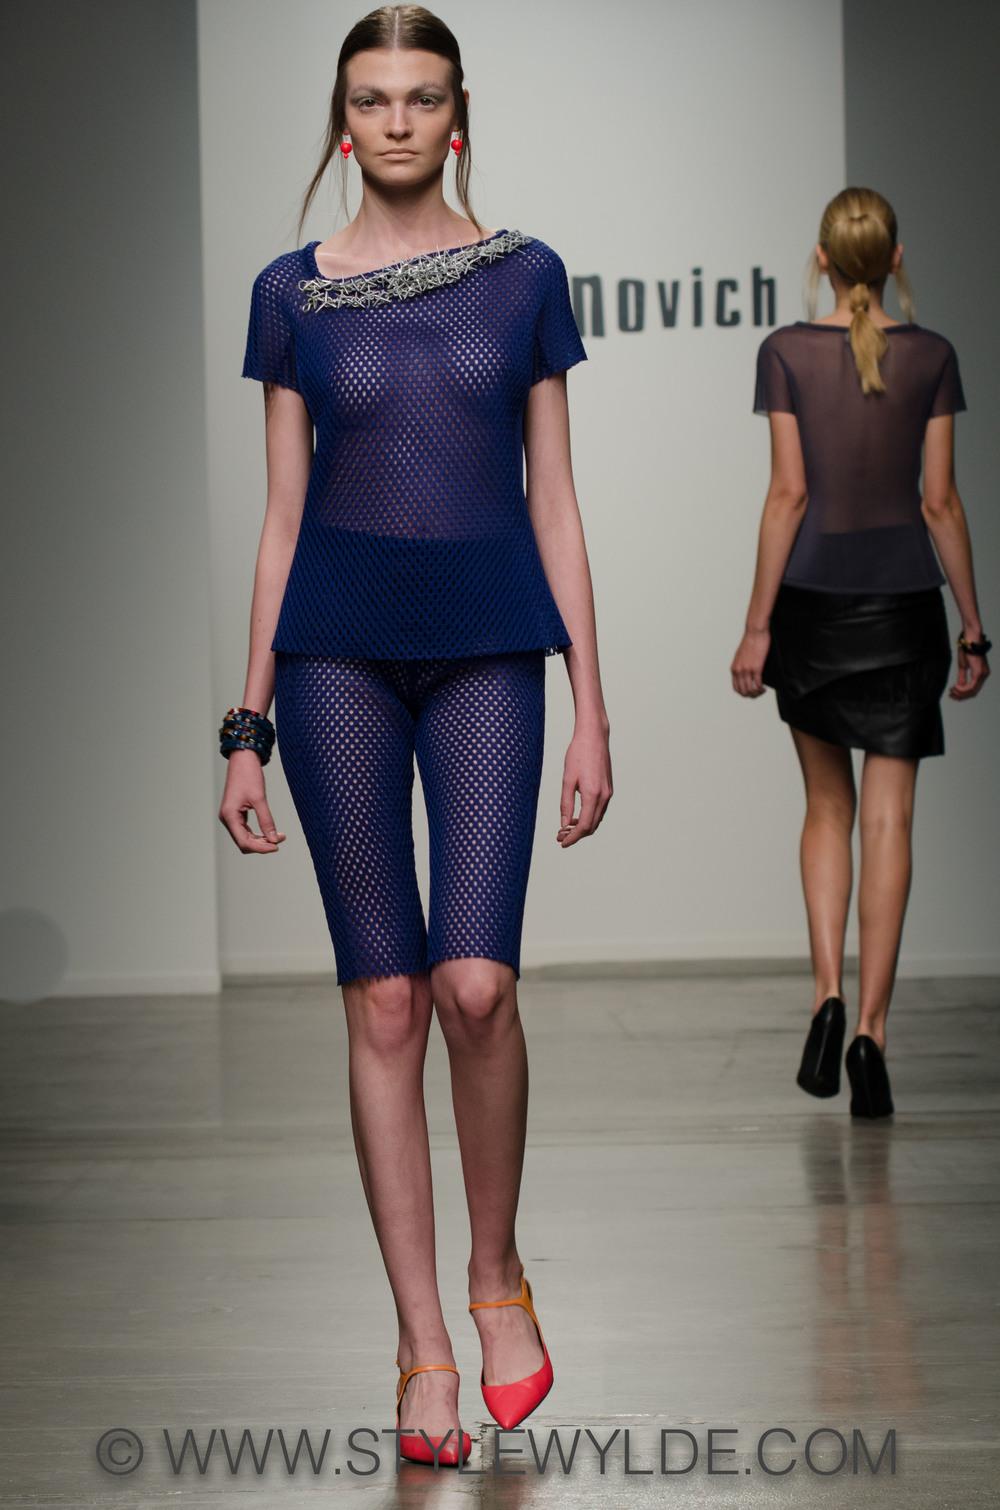 StyleWylde_KatyaSS15_FOH (13 of 28).jpg